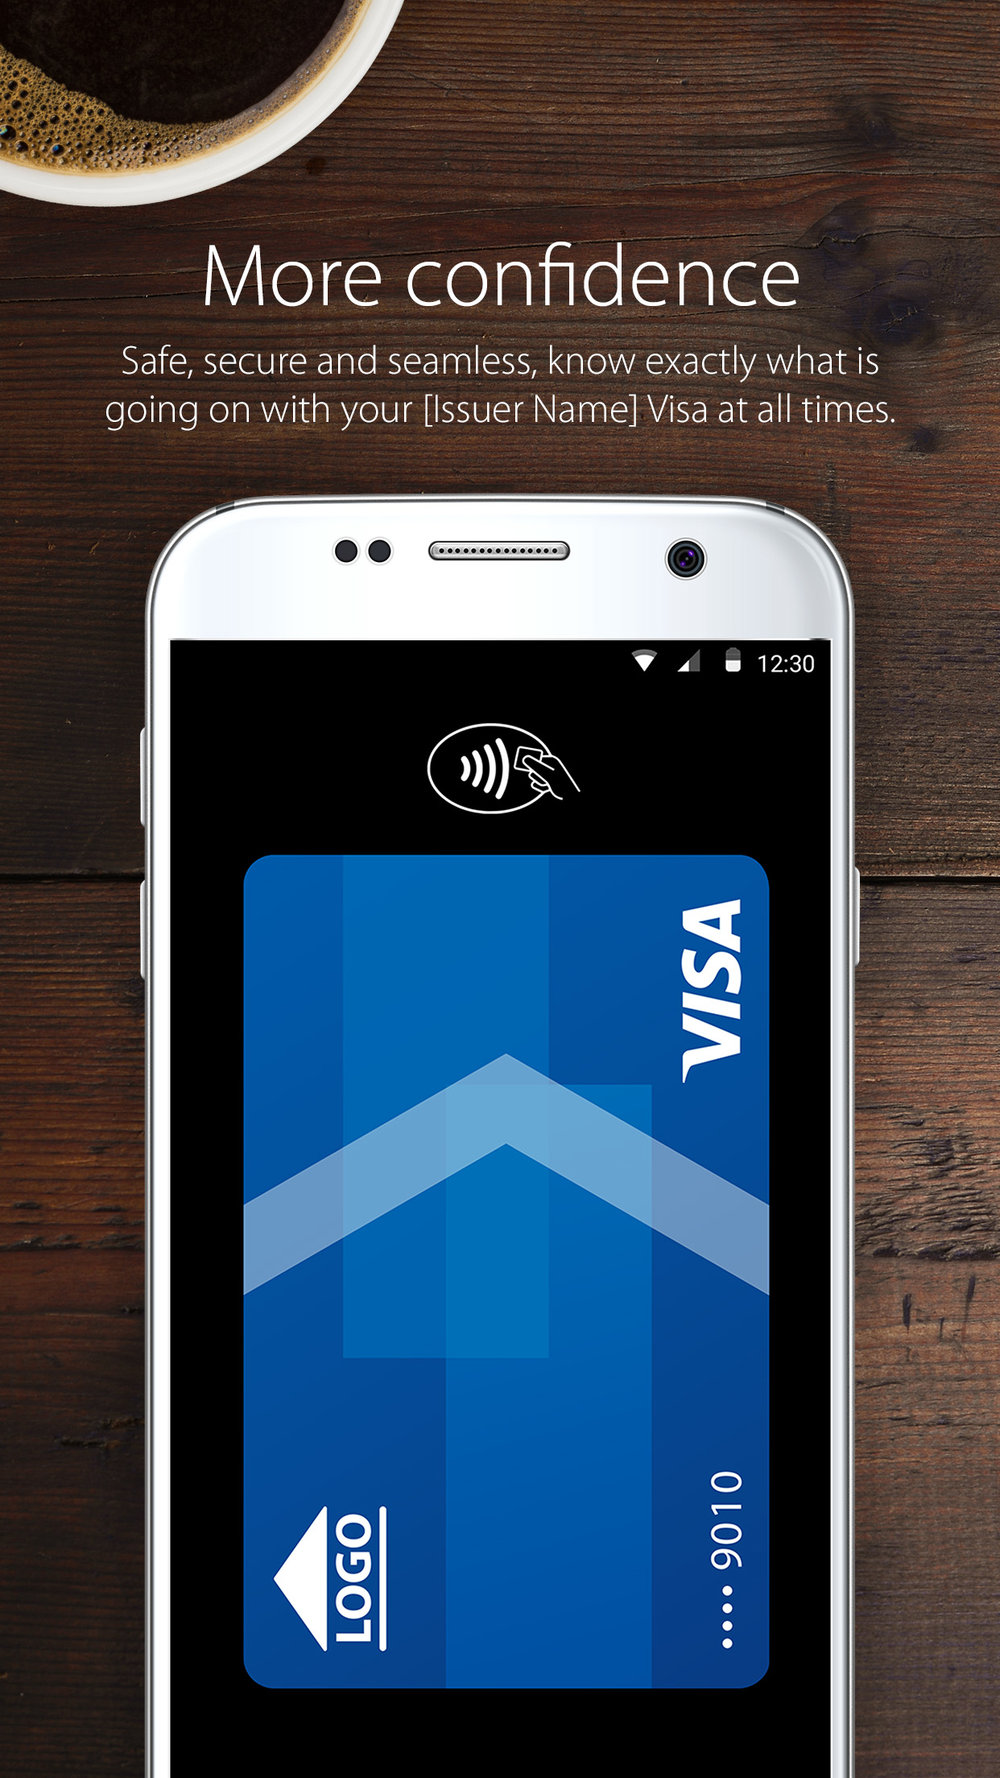 Visa-AppStore-_0005_3 Android.jpg